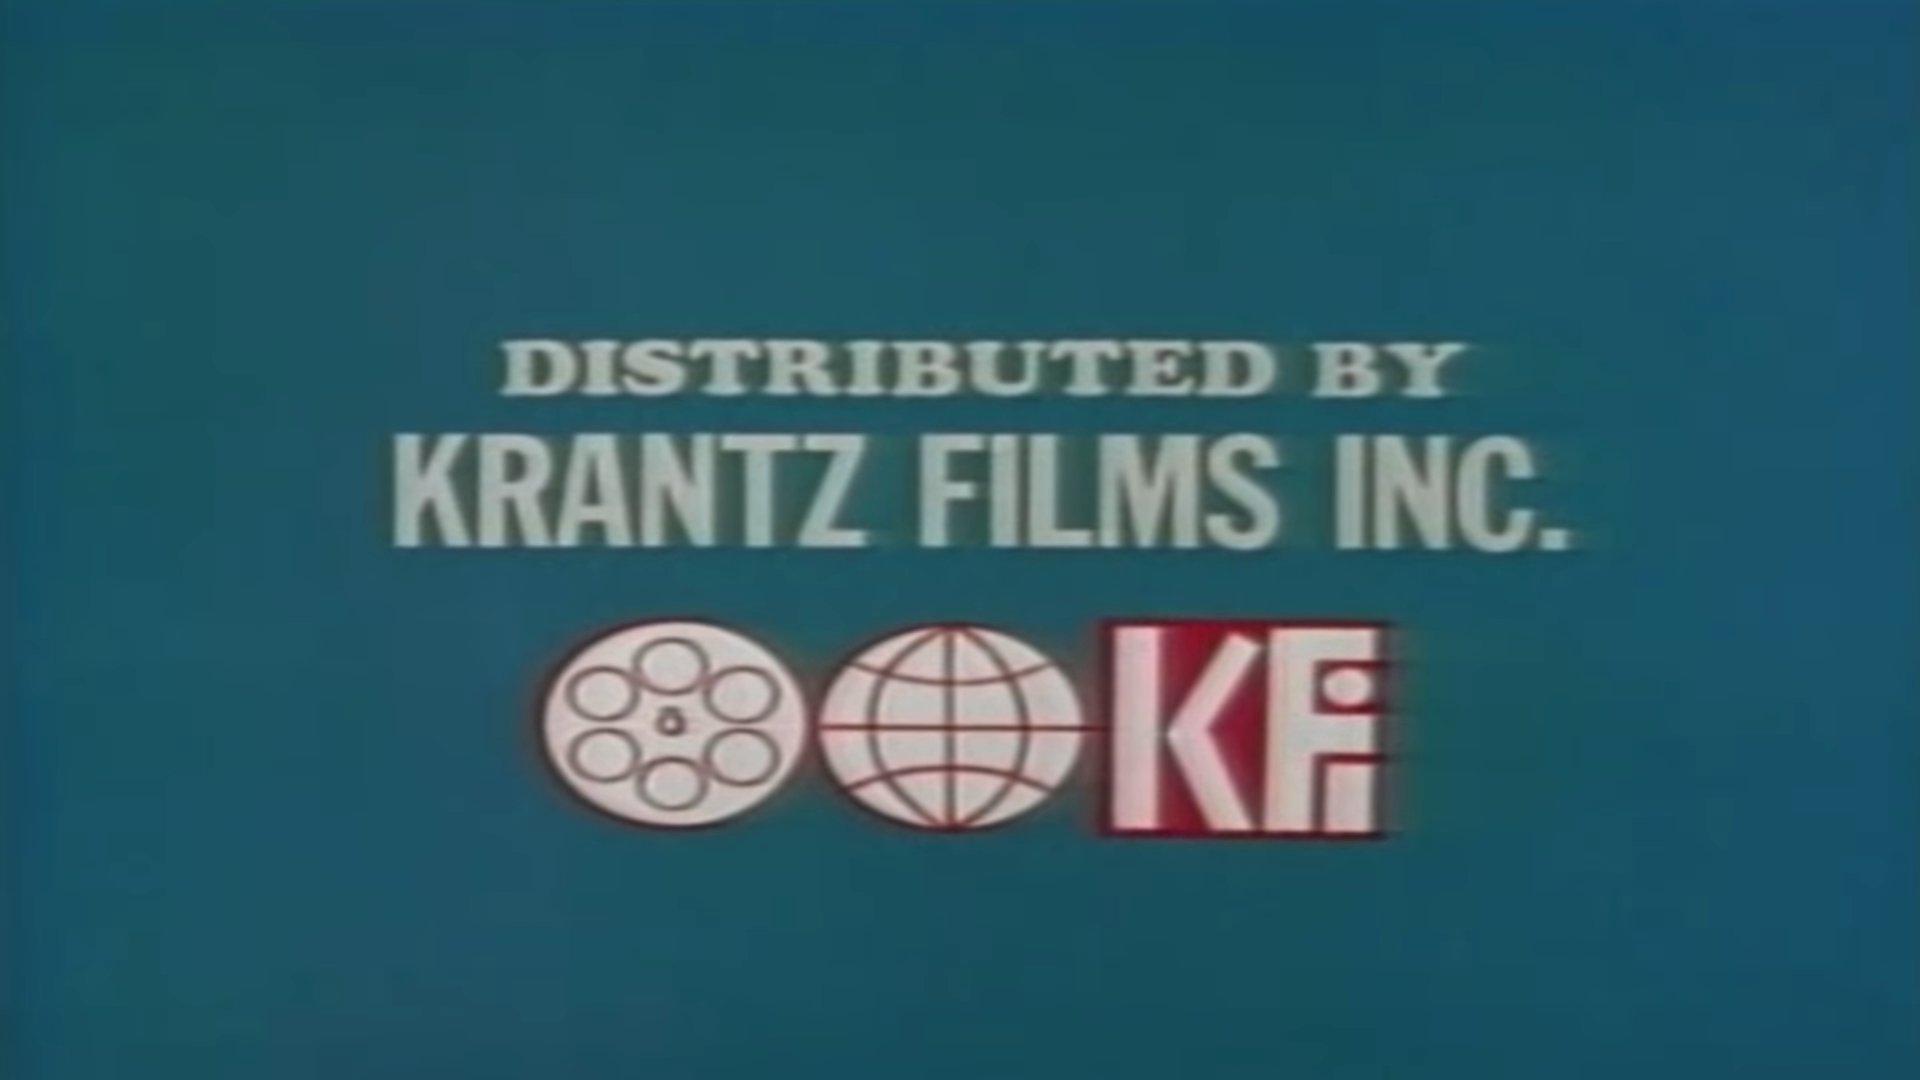 Krantz Films